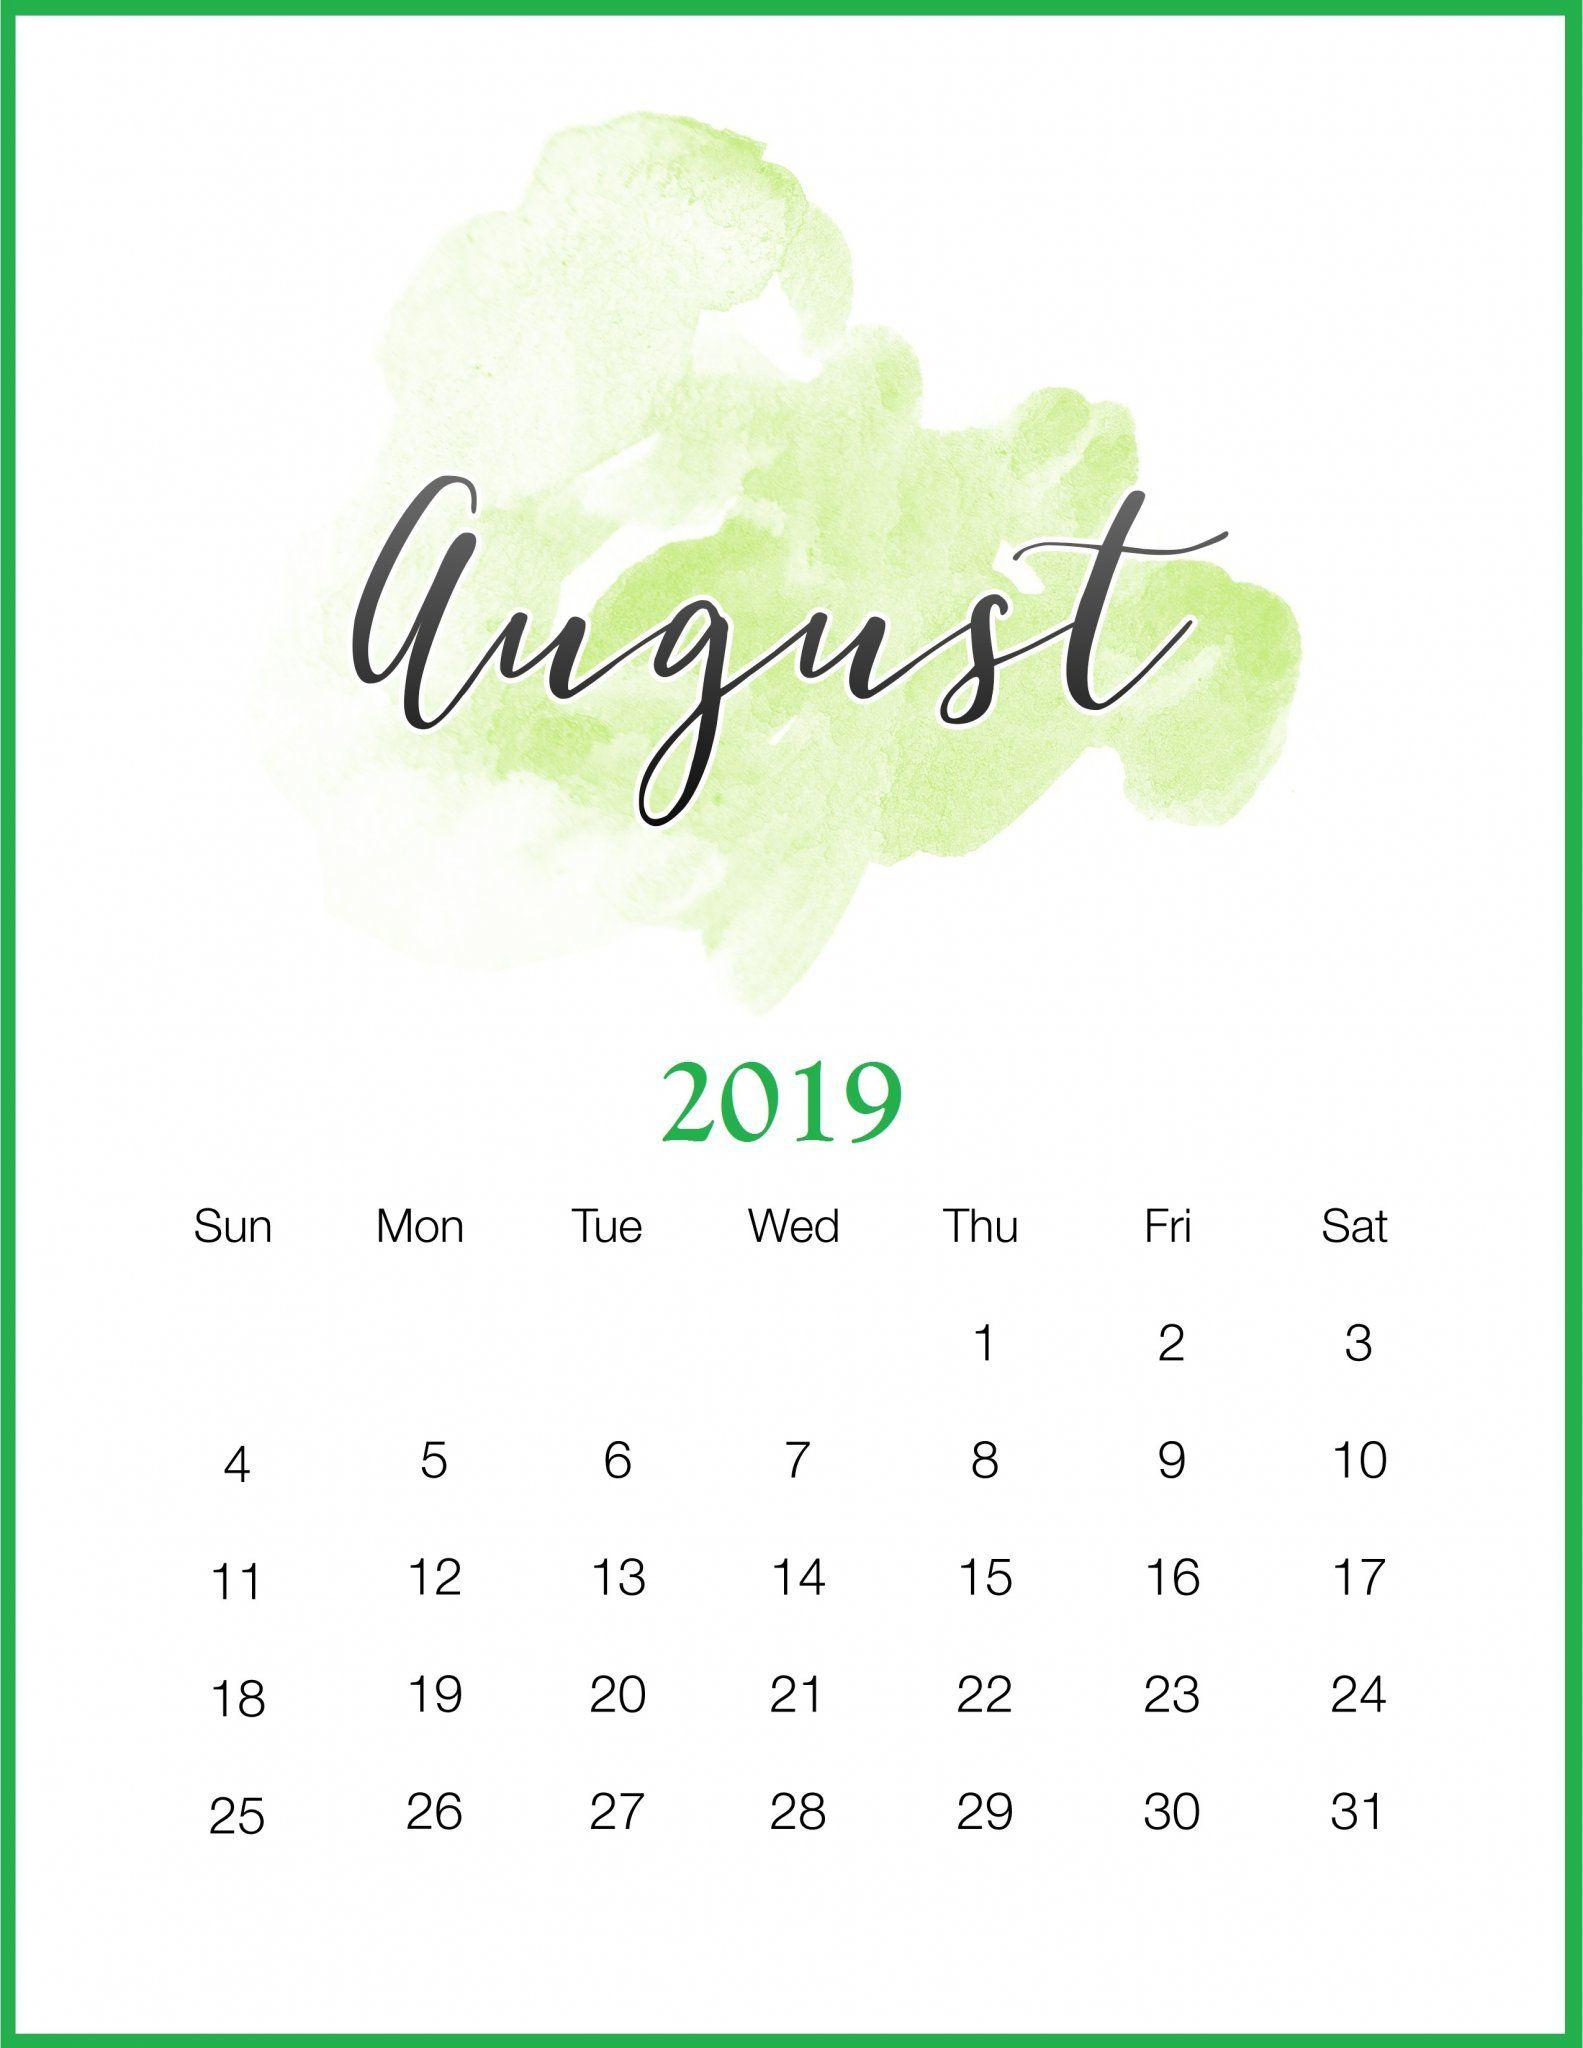 Watercolor August 2019 Printable Calendar